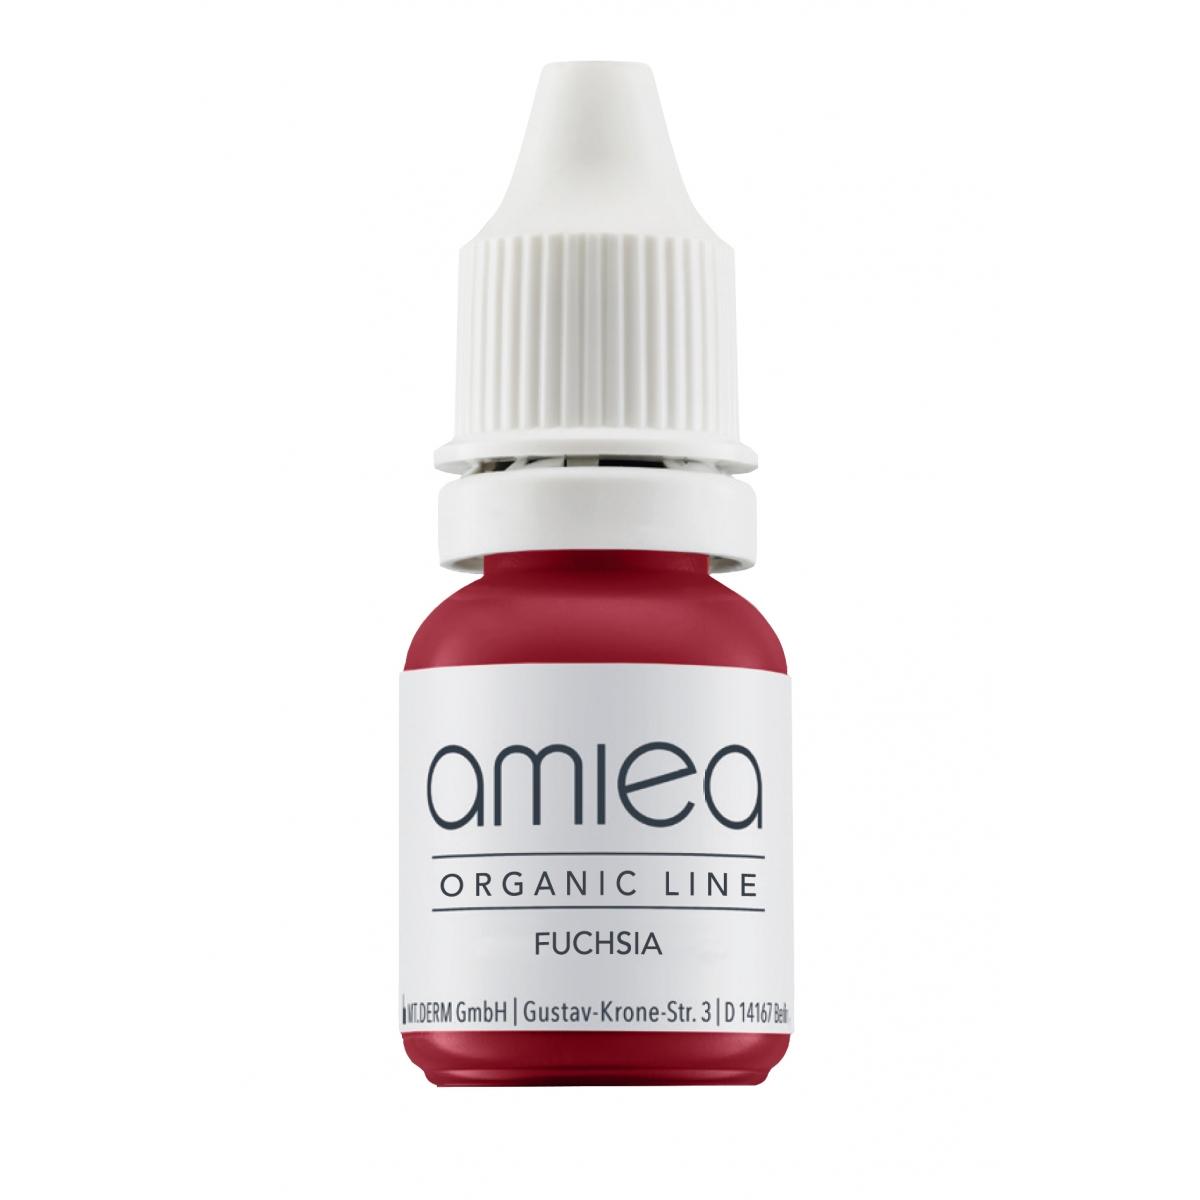 ORGANIC LINE (10ml) - PIGMENT FUSCHIA ORGANICLINE AMIEA (10 ml)